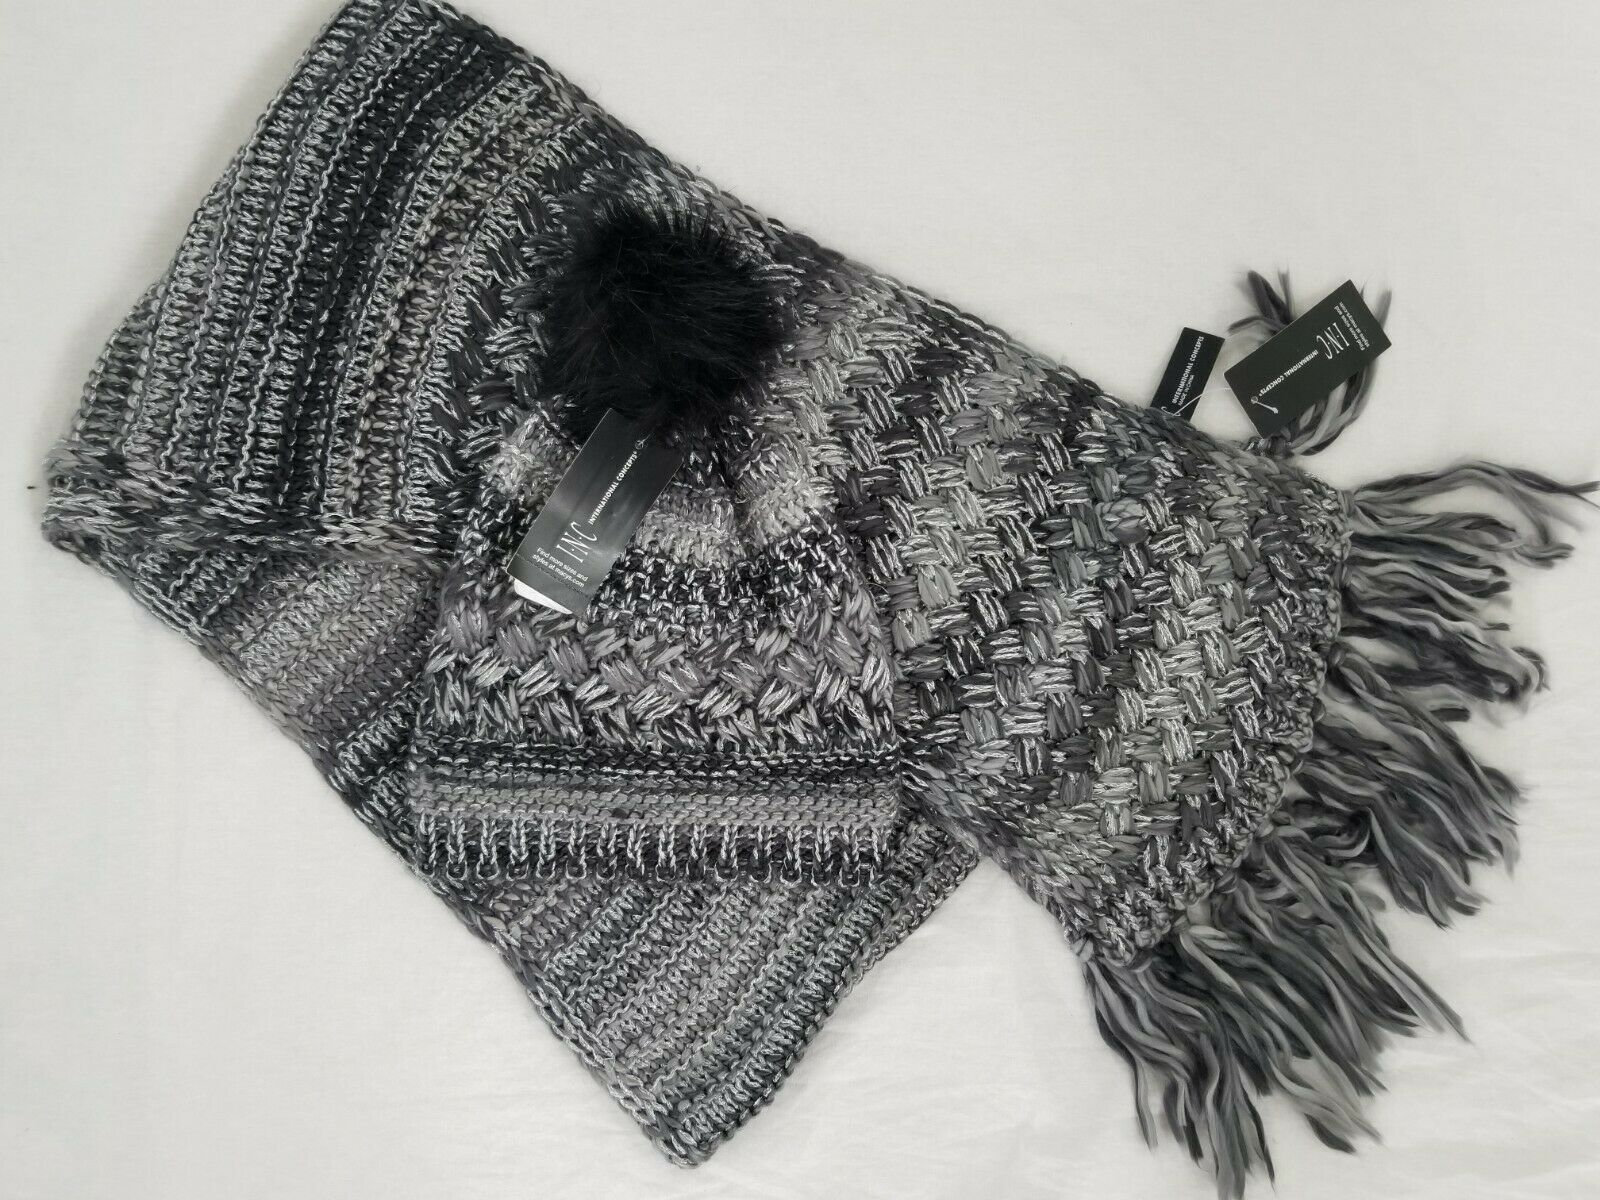 Inc International Concepts black knit winter scarf and pom pom hat gift set